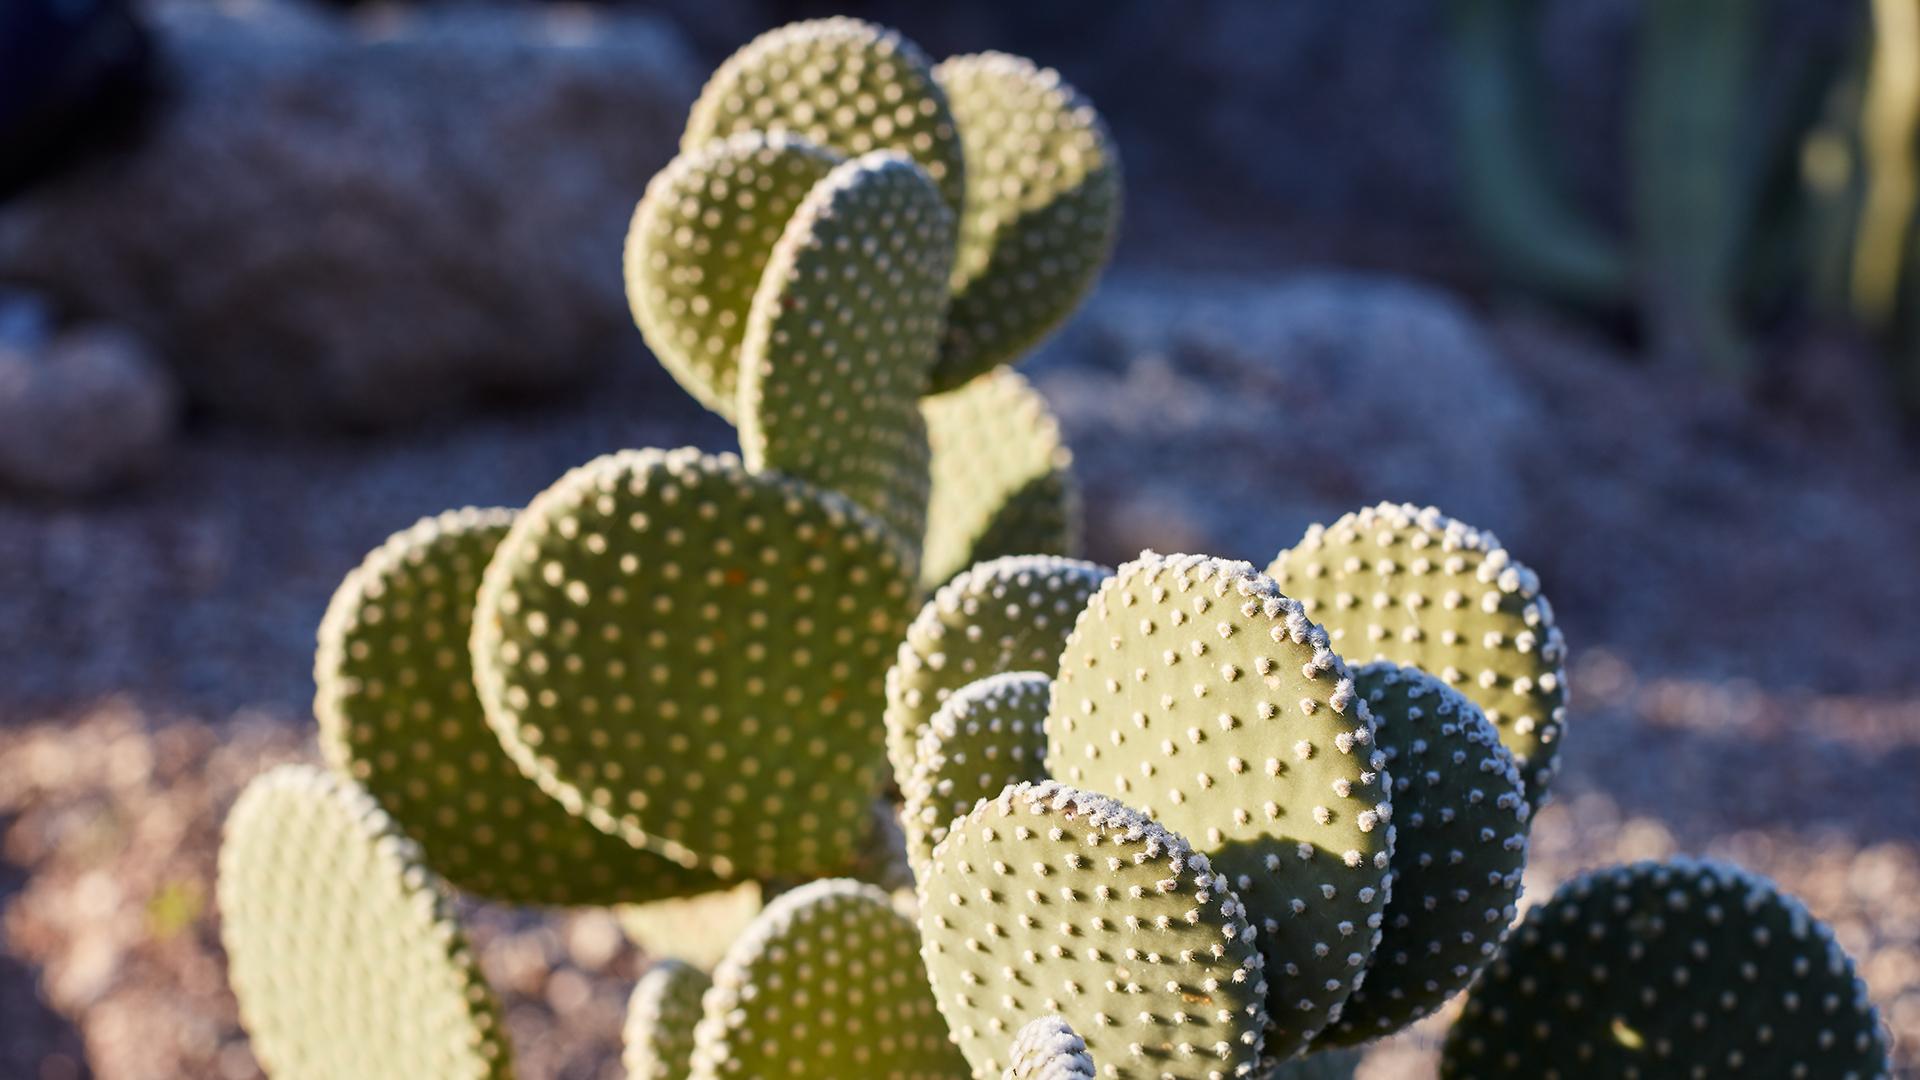 Take a relaxed stroll through the desert landscape along the Cactus Garden trail.